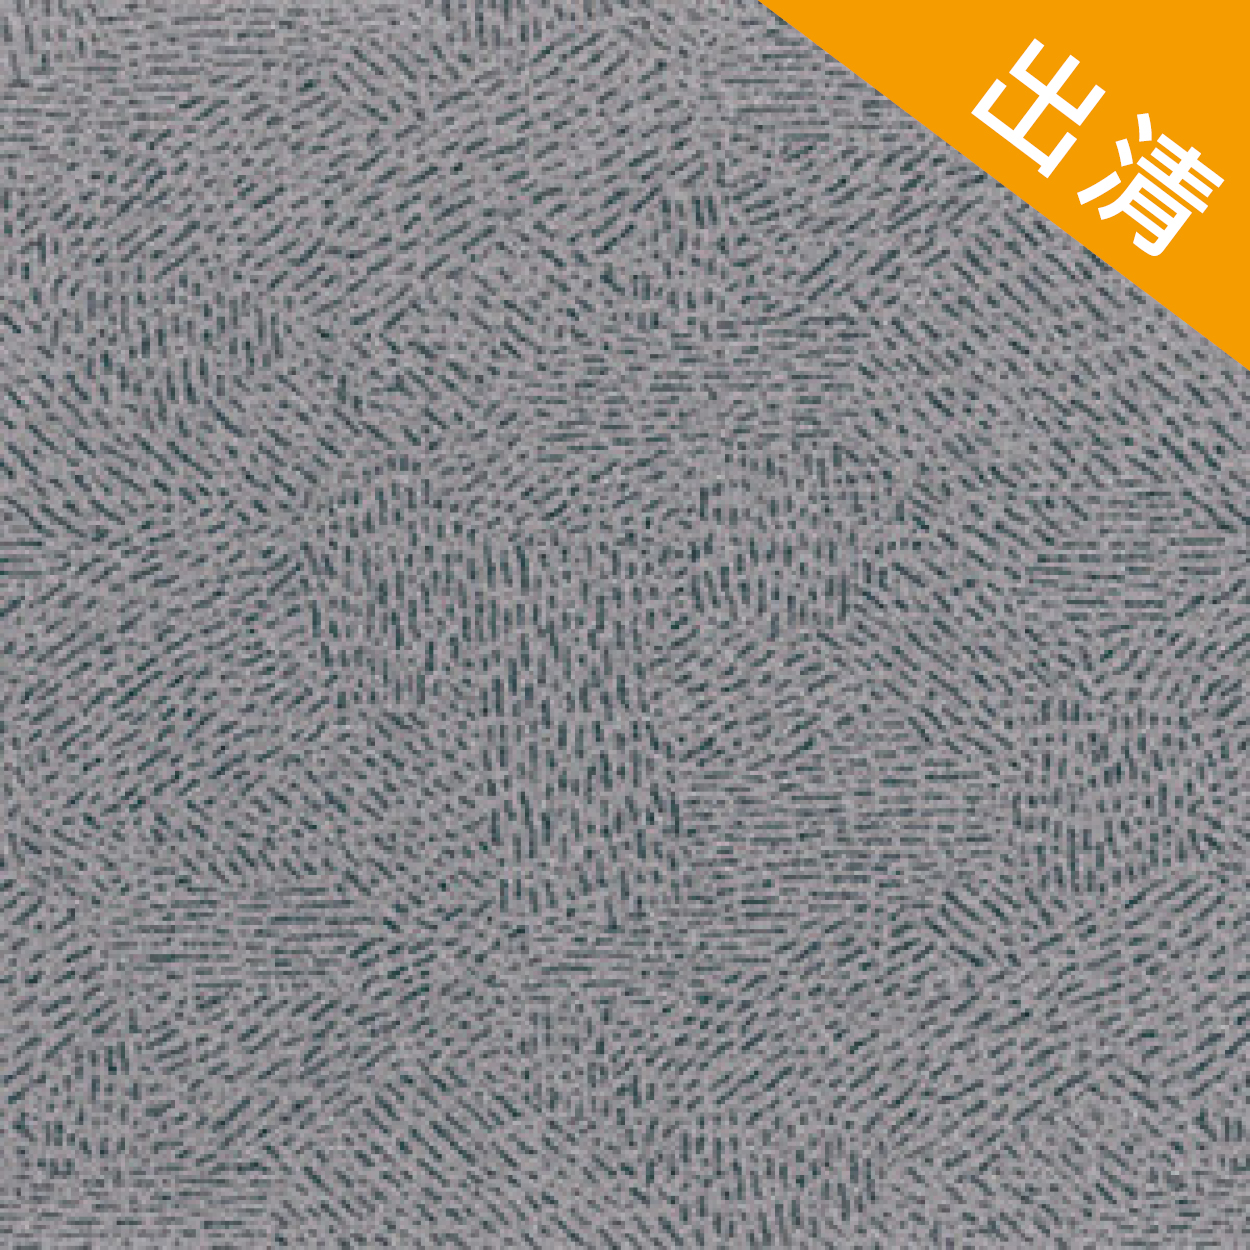 Flotex Montana  英國靜電植絨方塊地毯 現貨/售完為止(共5色) 100% Nylon 50 x 50 cm